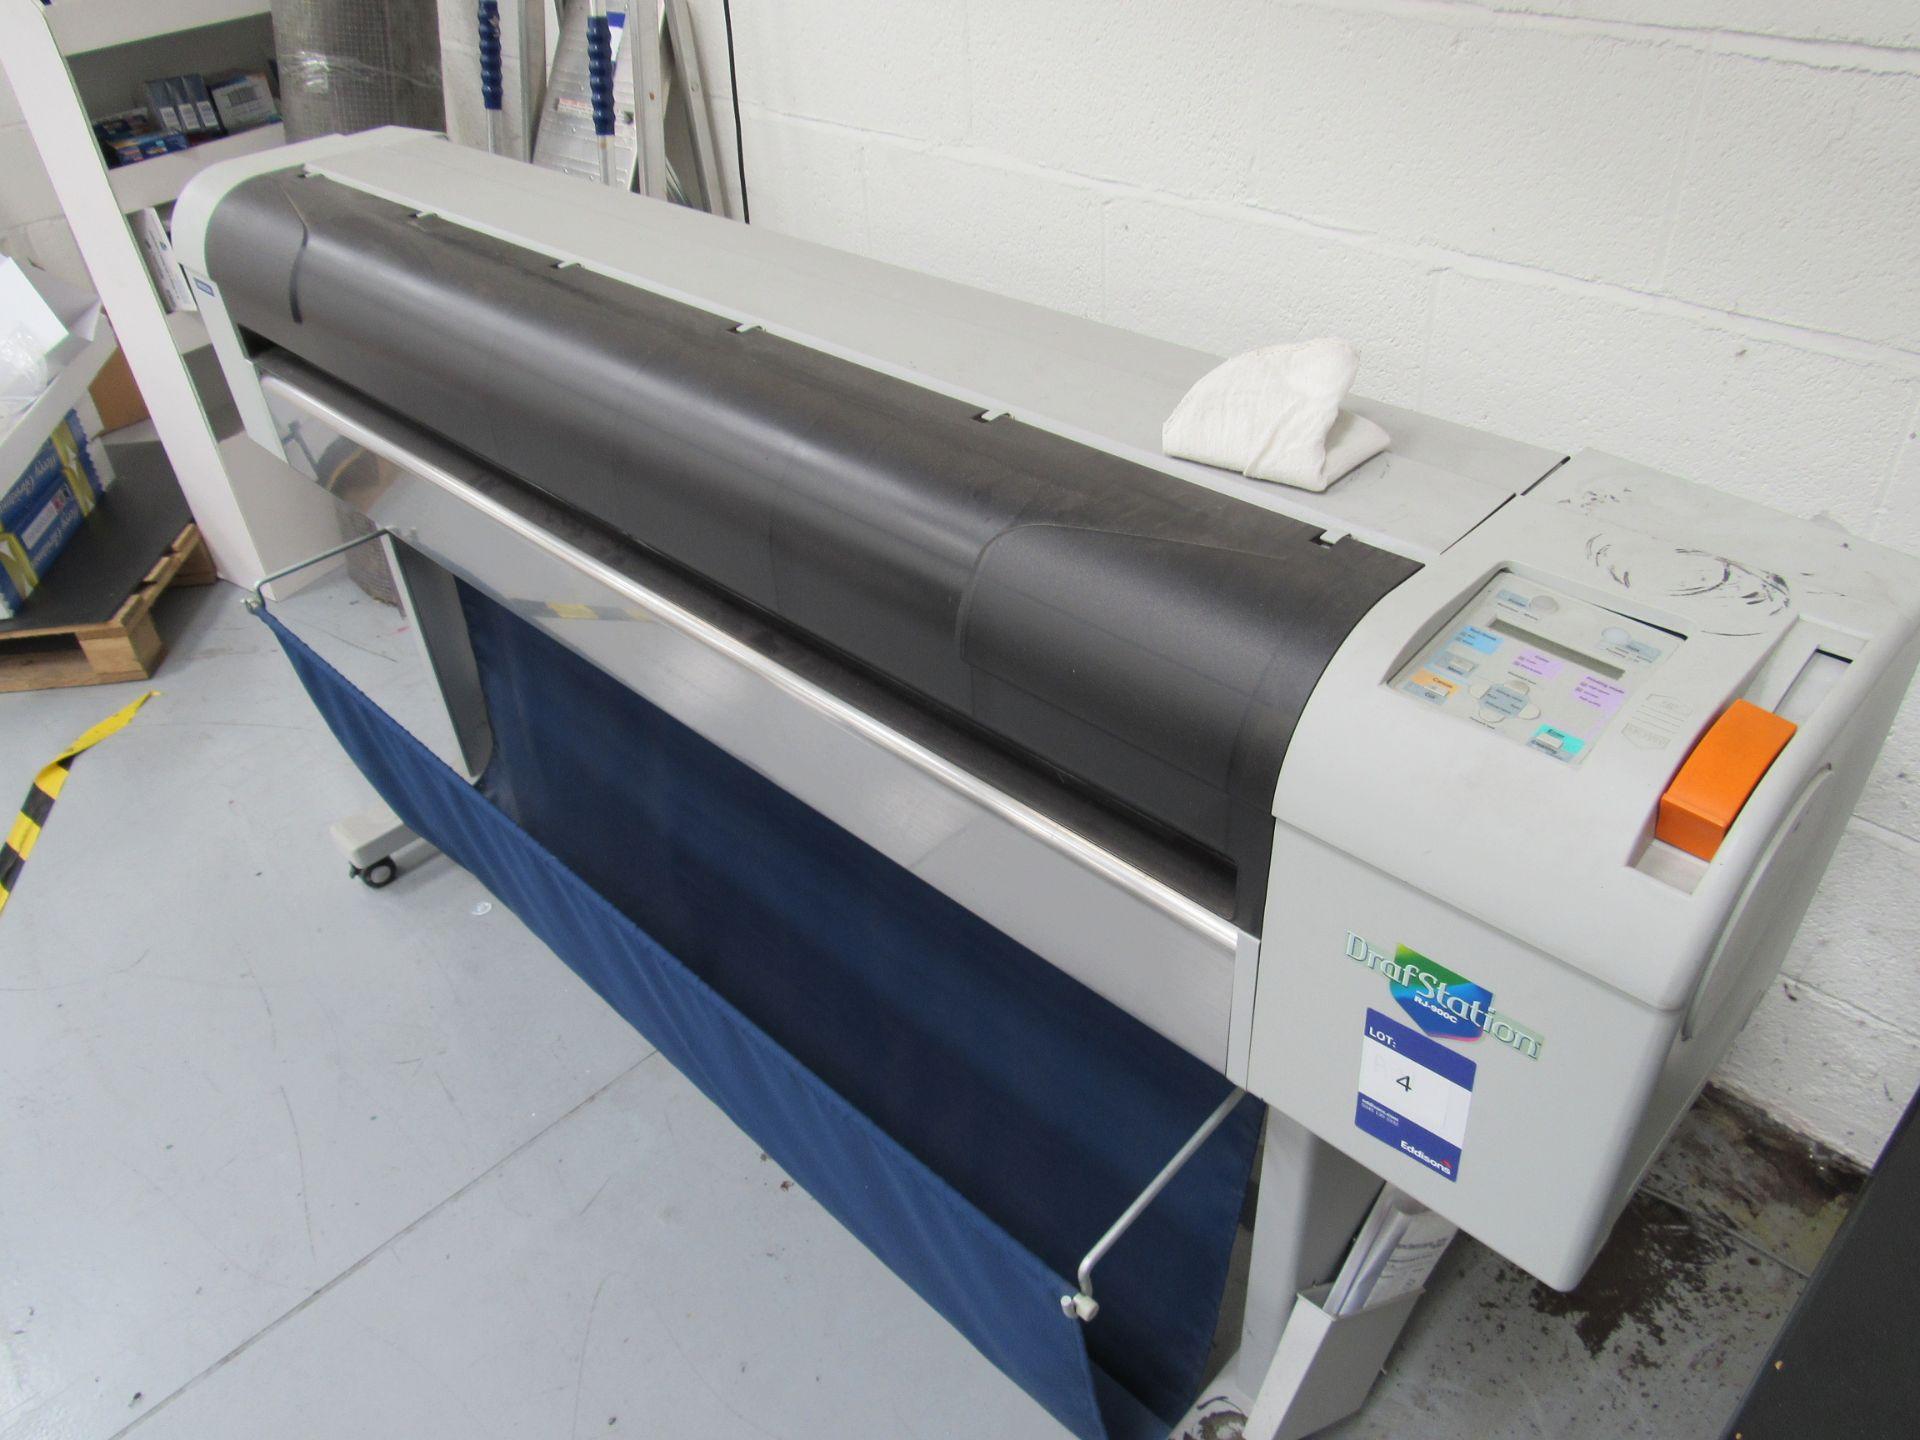 Mlitoh RJ-900C Wide Format Printer 1150mm Serial Number FN4E004886 - Image 3 of 5